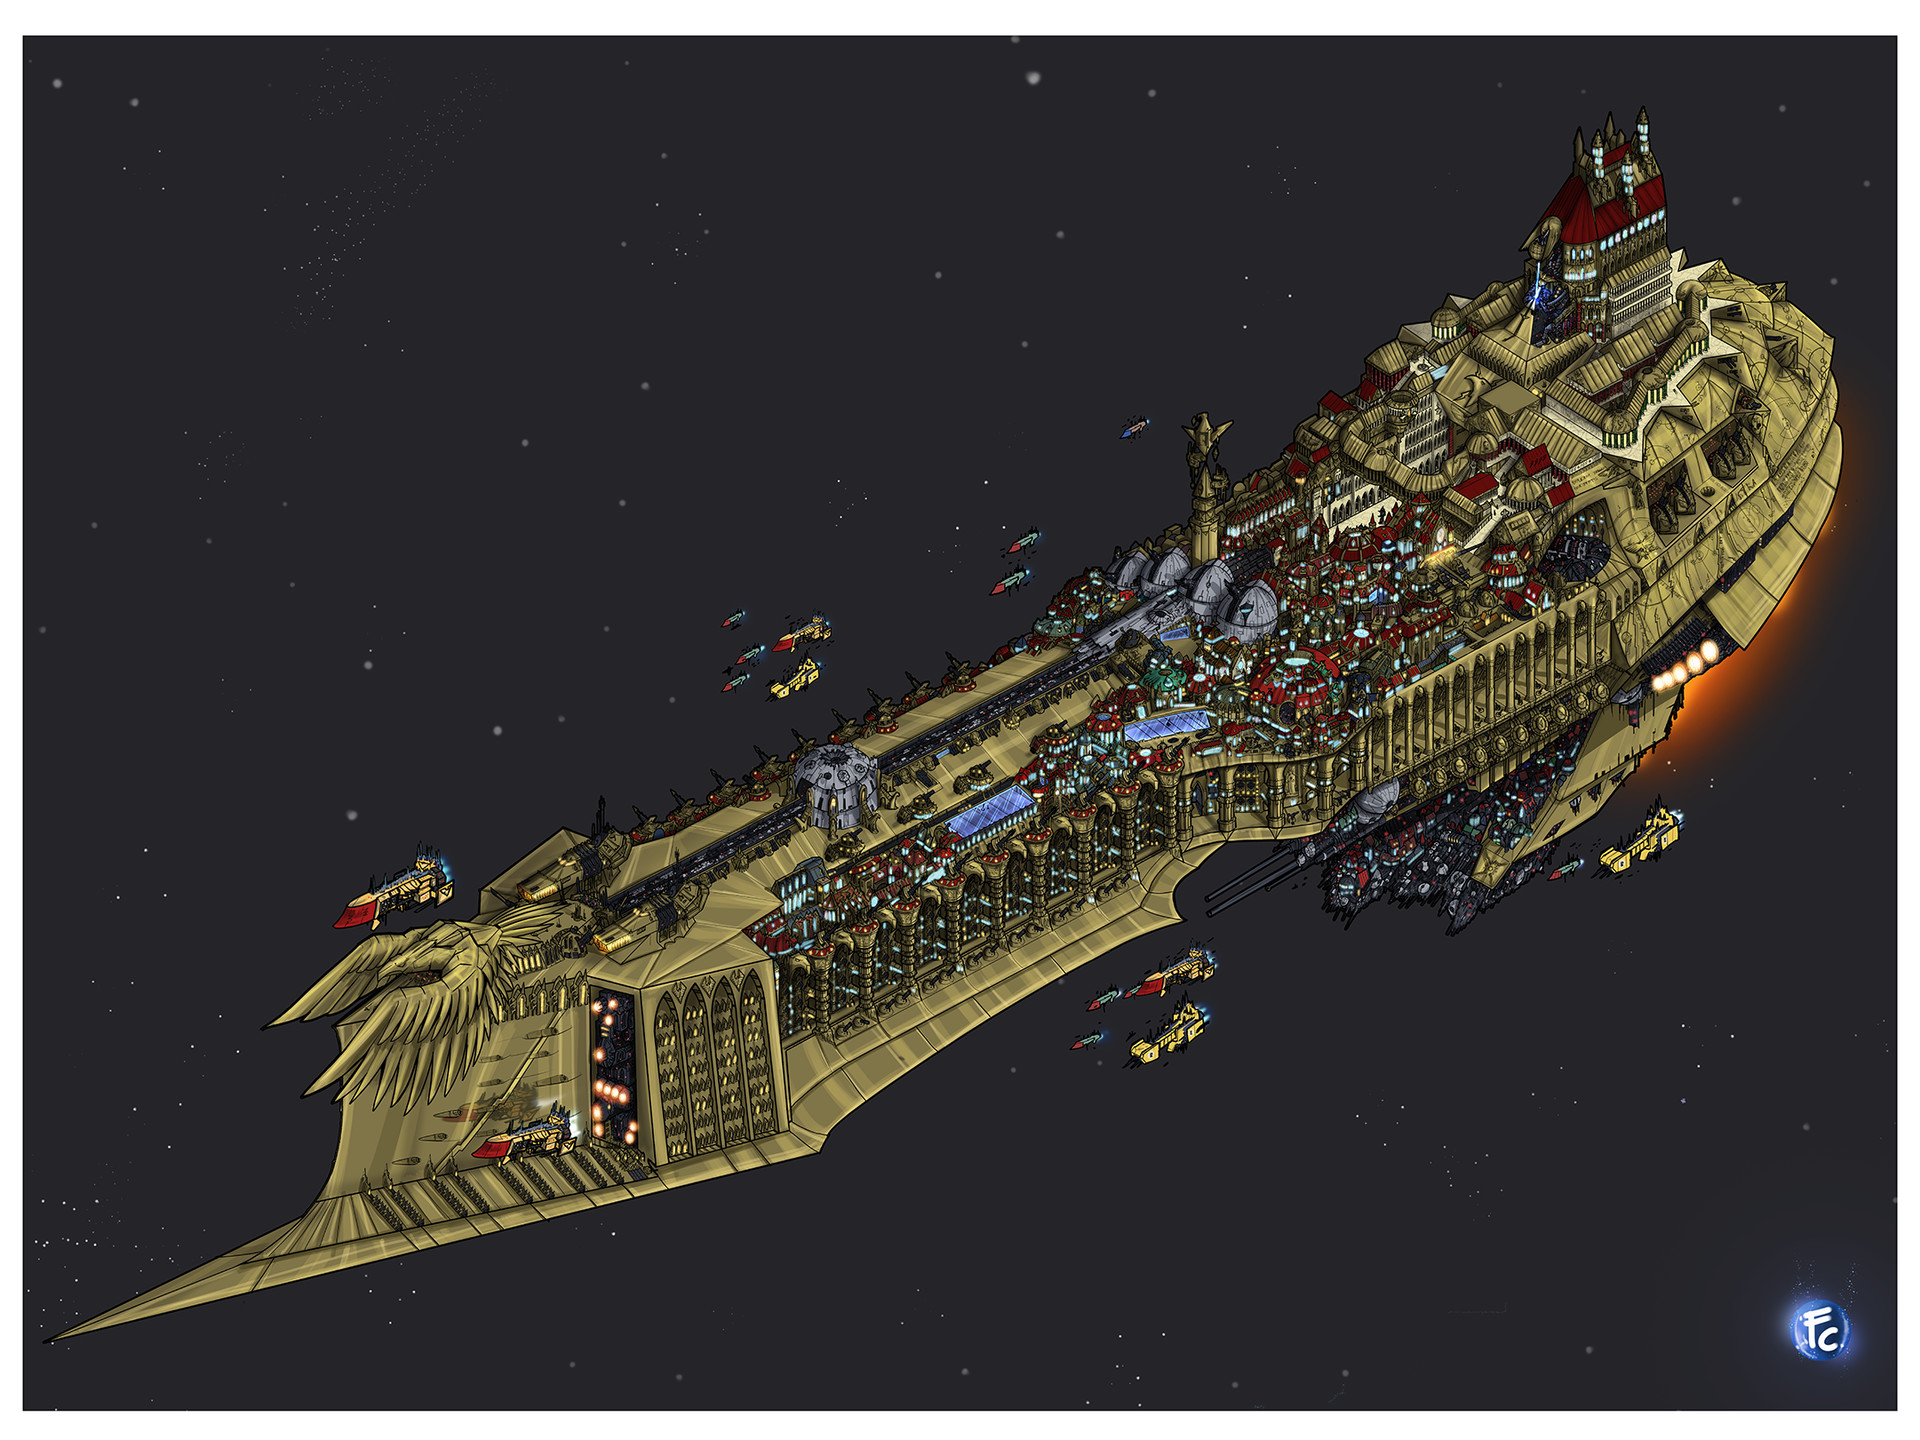 Warhammer 40k Void Ship Imperator Somnium original file 12000x16000 pixels